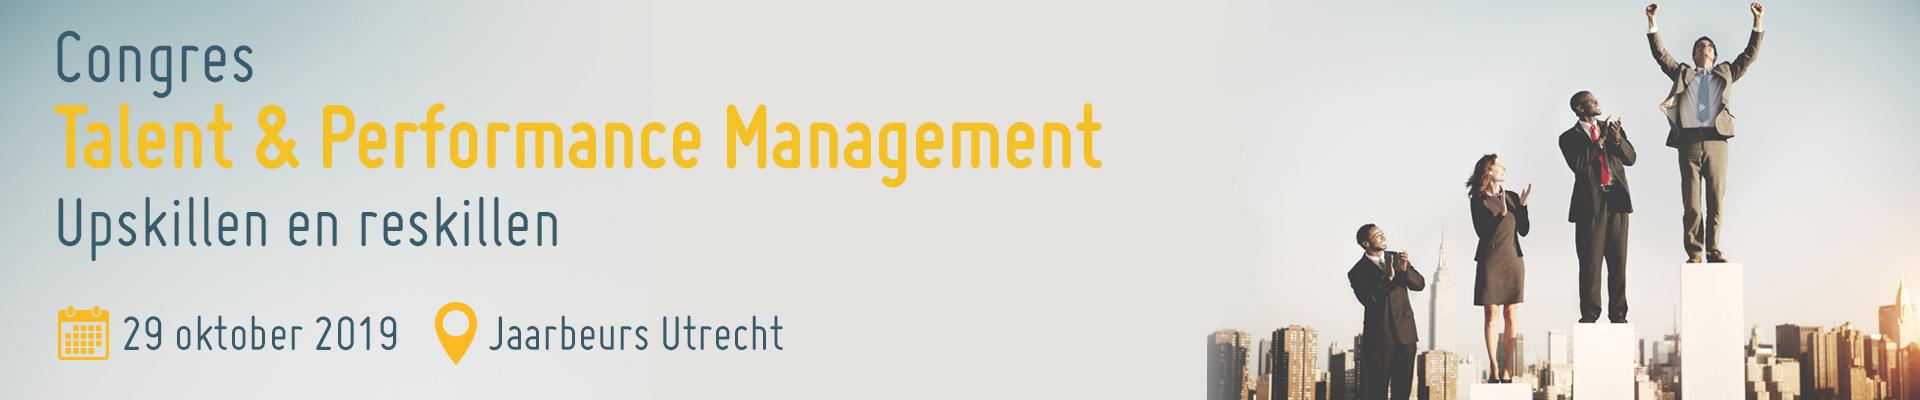 Congres Talent & Performance Management 2019